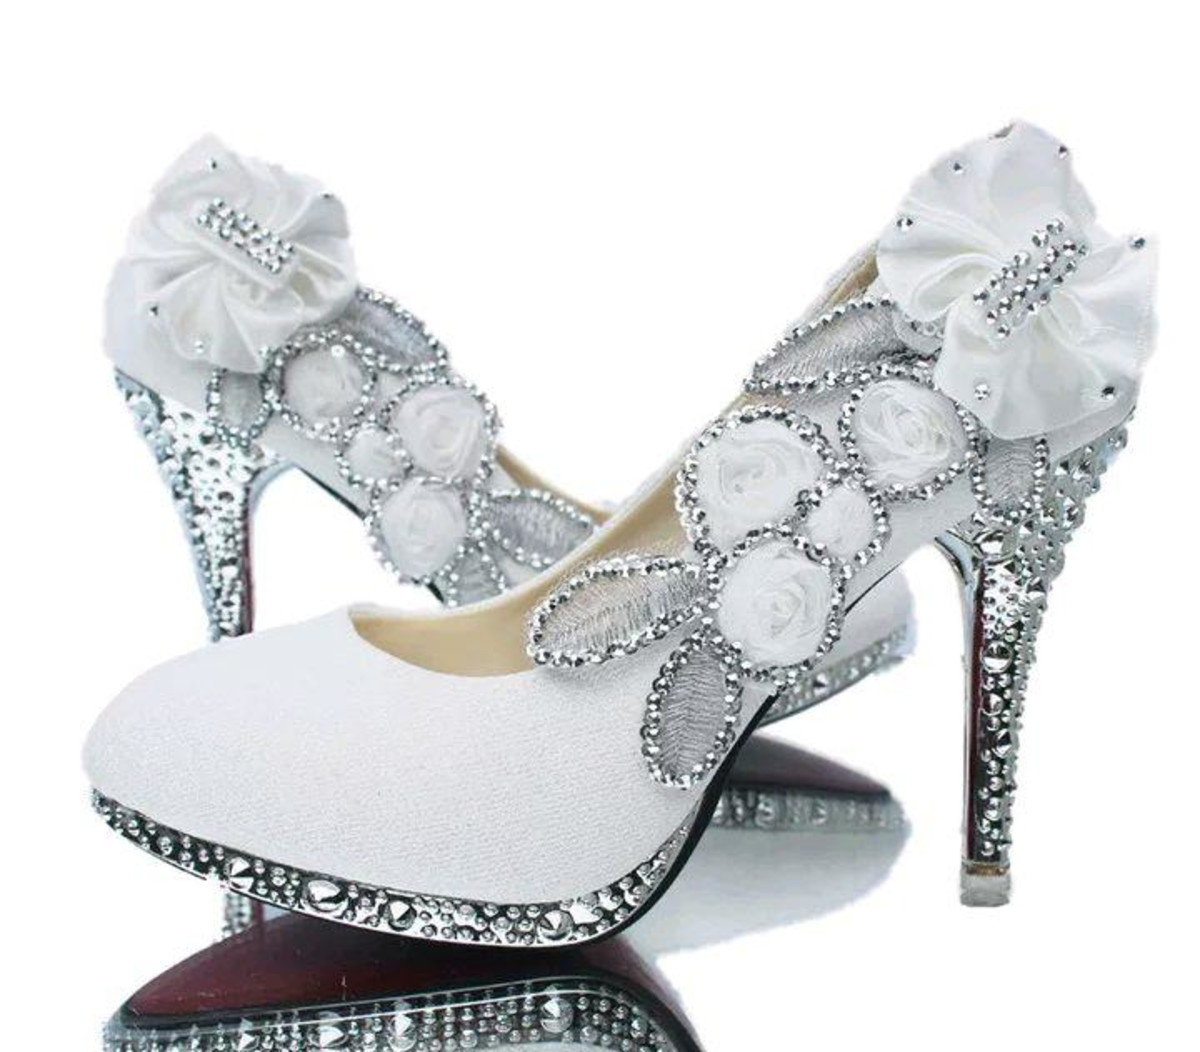 b6e2afd22d Sapato de Noiva Branco personalizado no Elo7